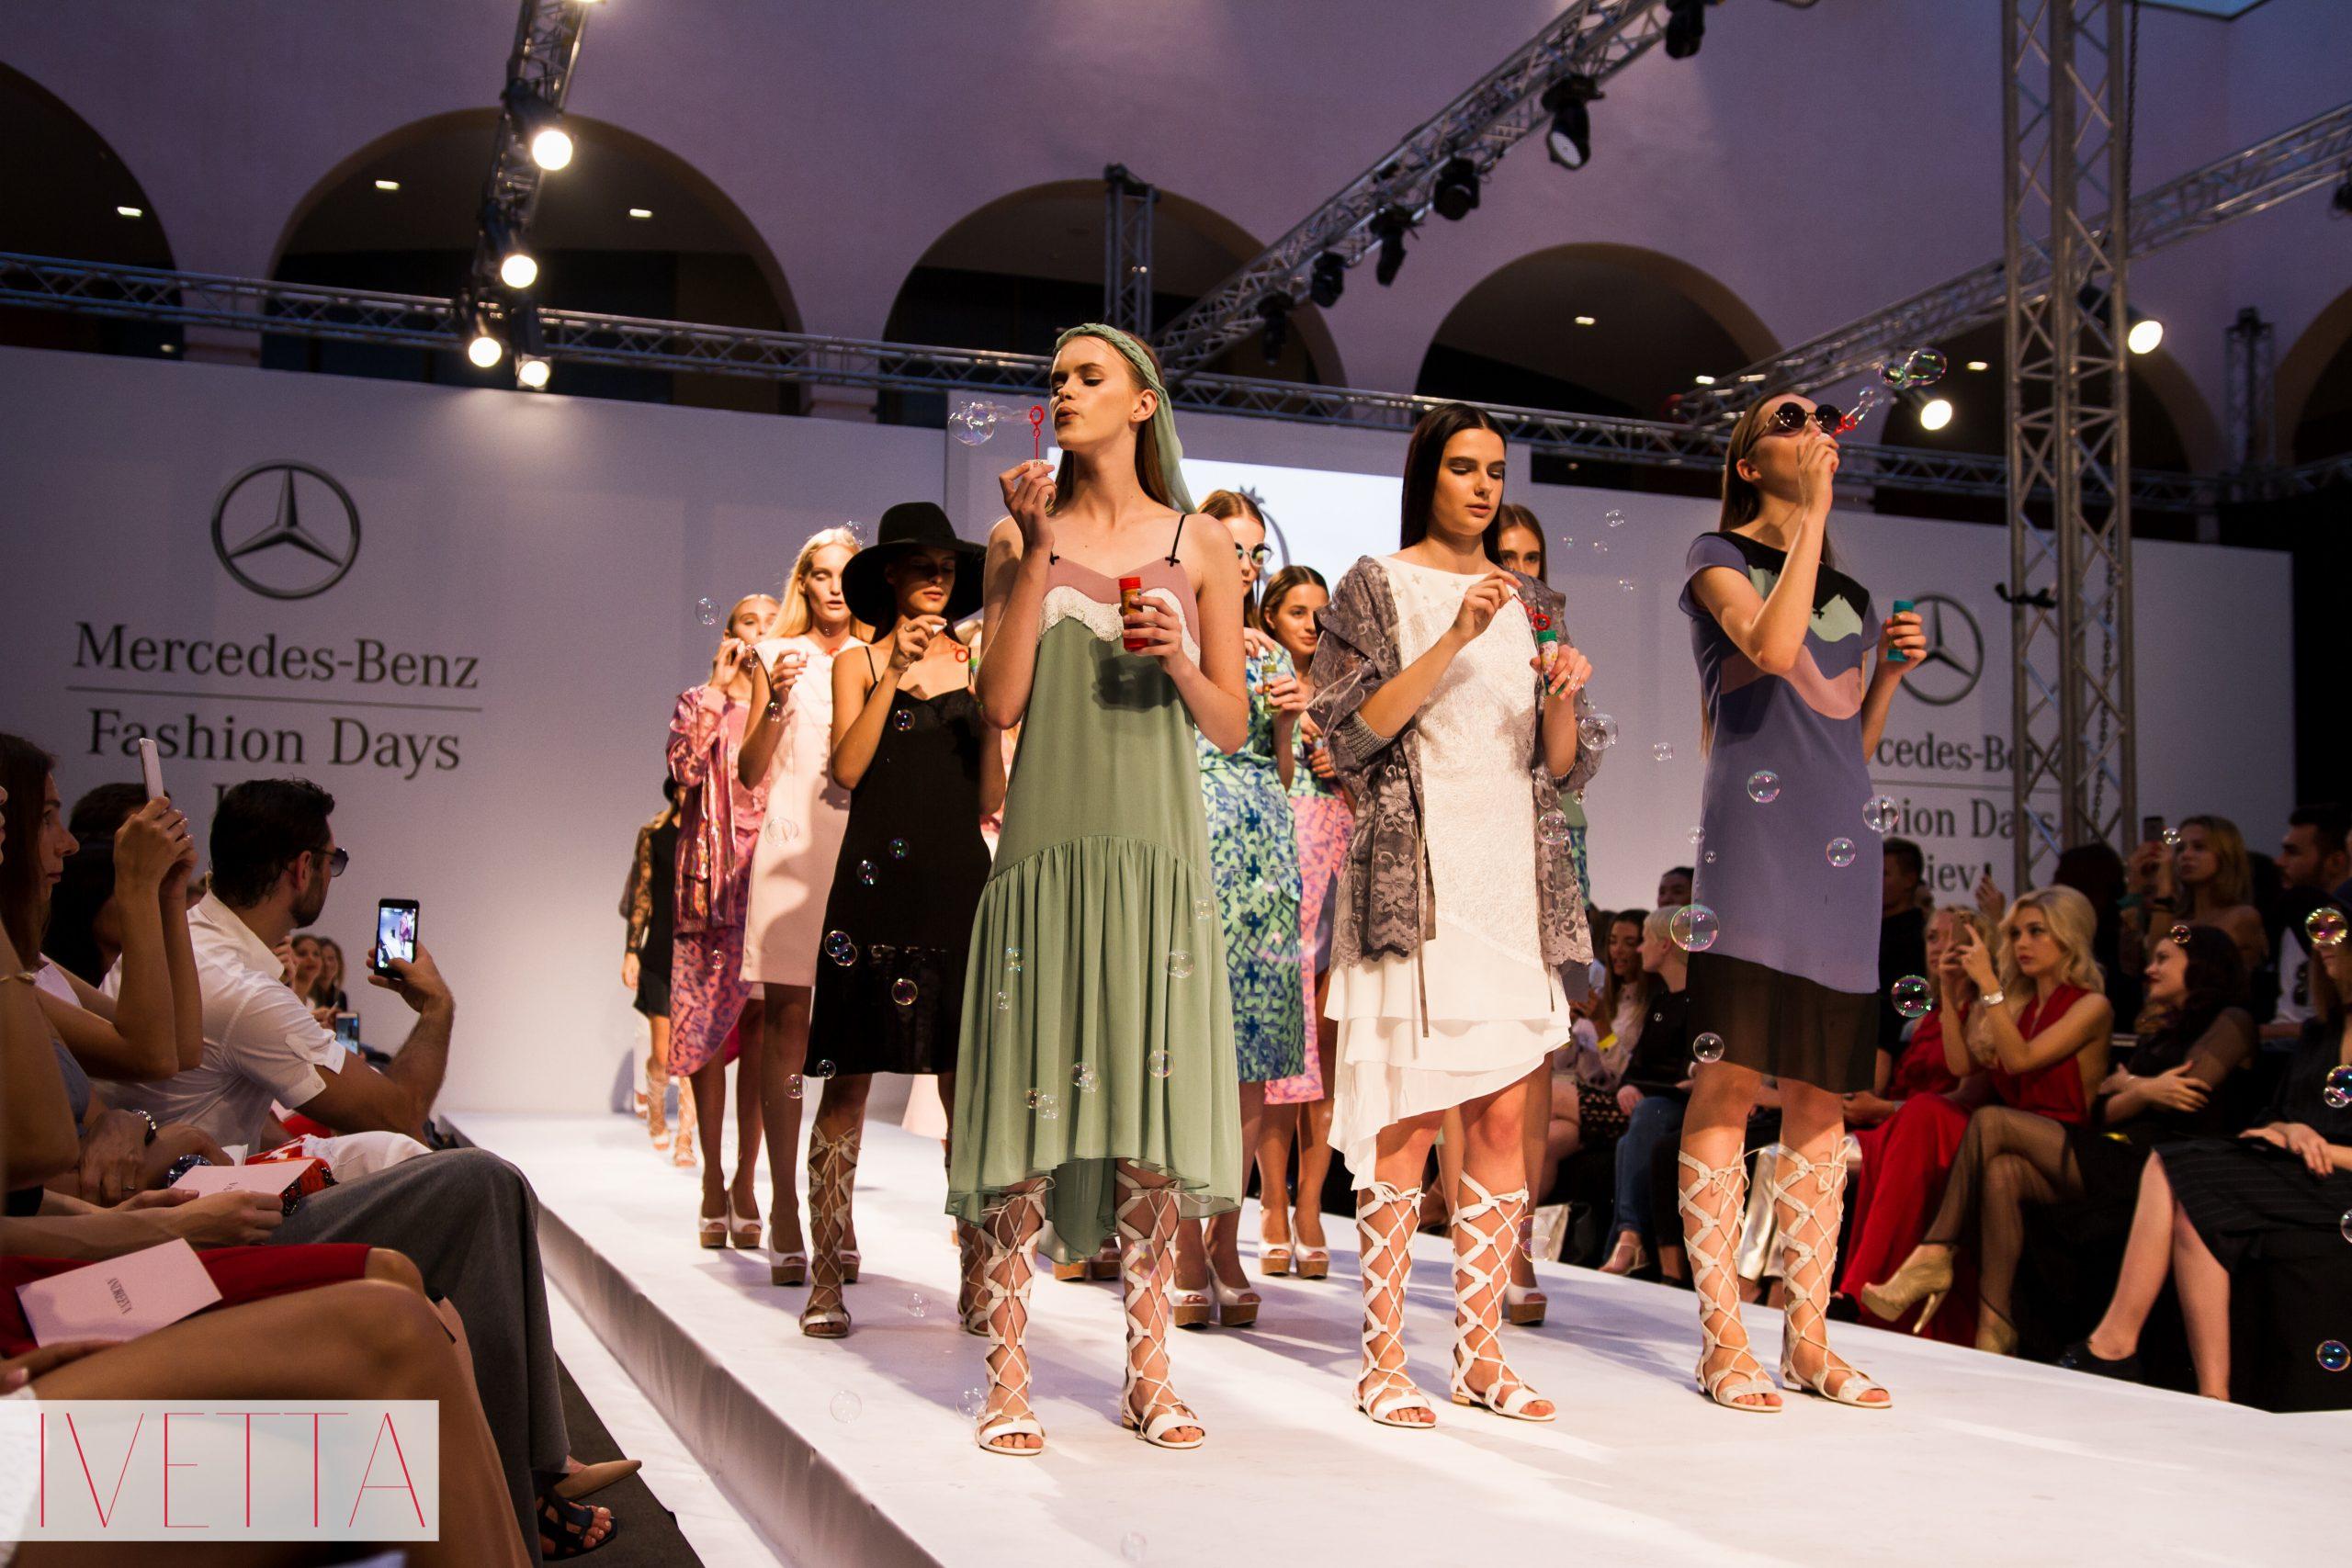 Коллекция Andreeva на Mercedes-Benz Kiev Fashion Days 2015 21